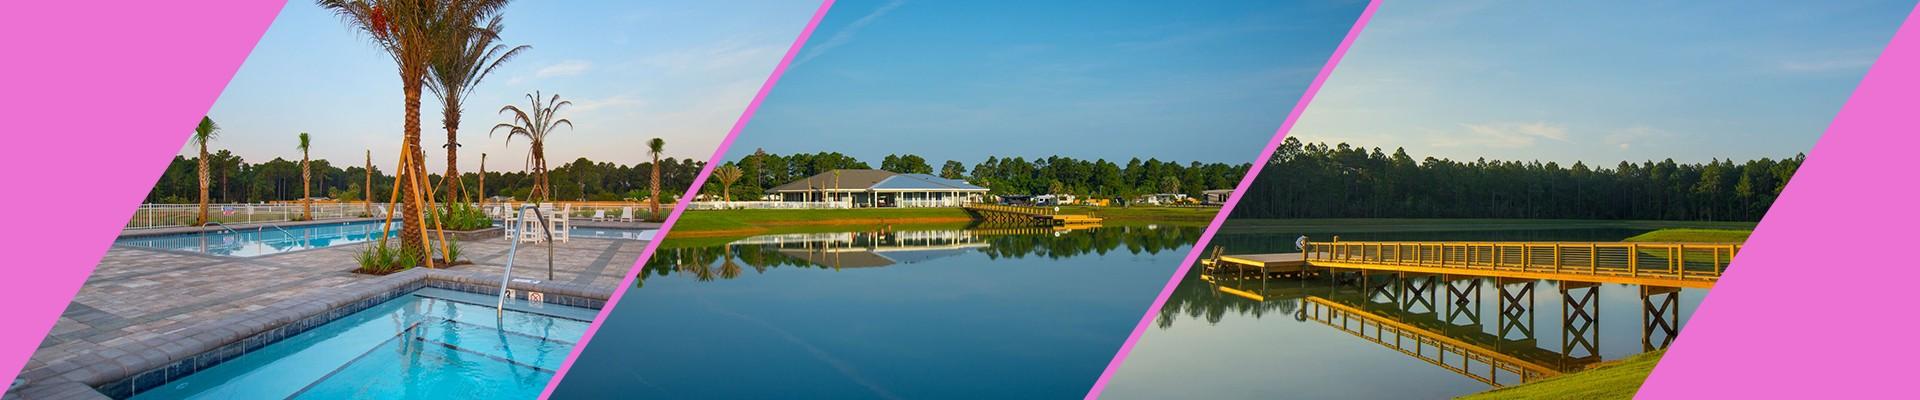 Pandion Ridge Luxury RV Resort in Orange Beach, Alabama